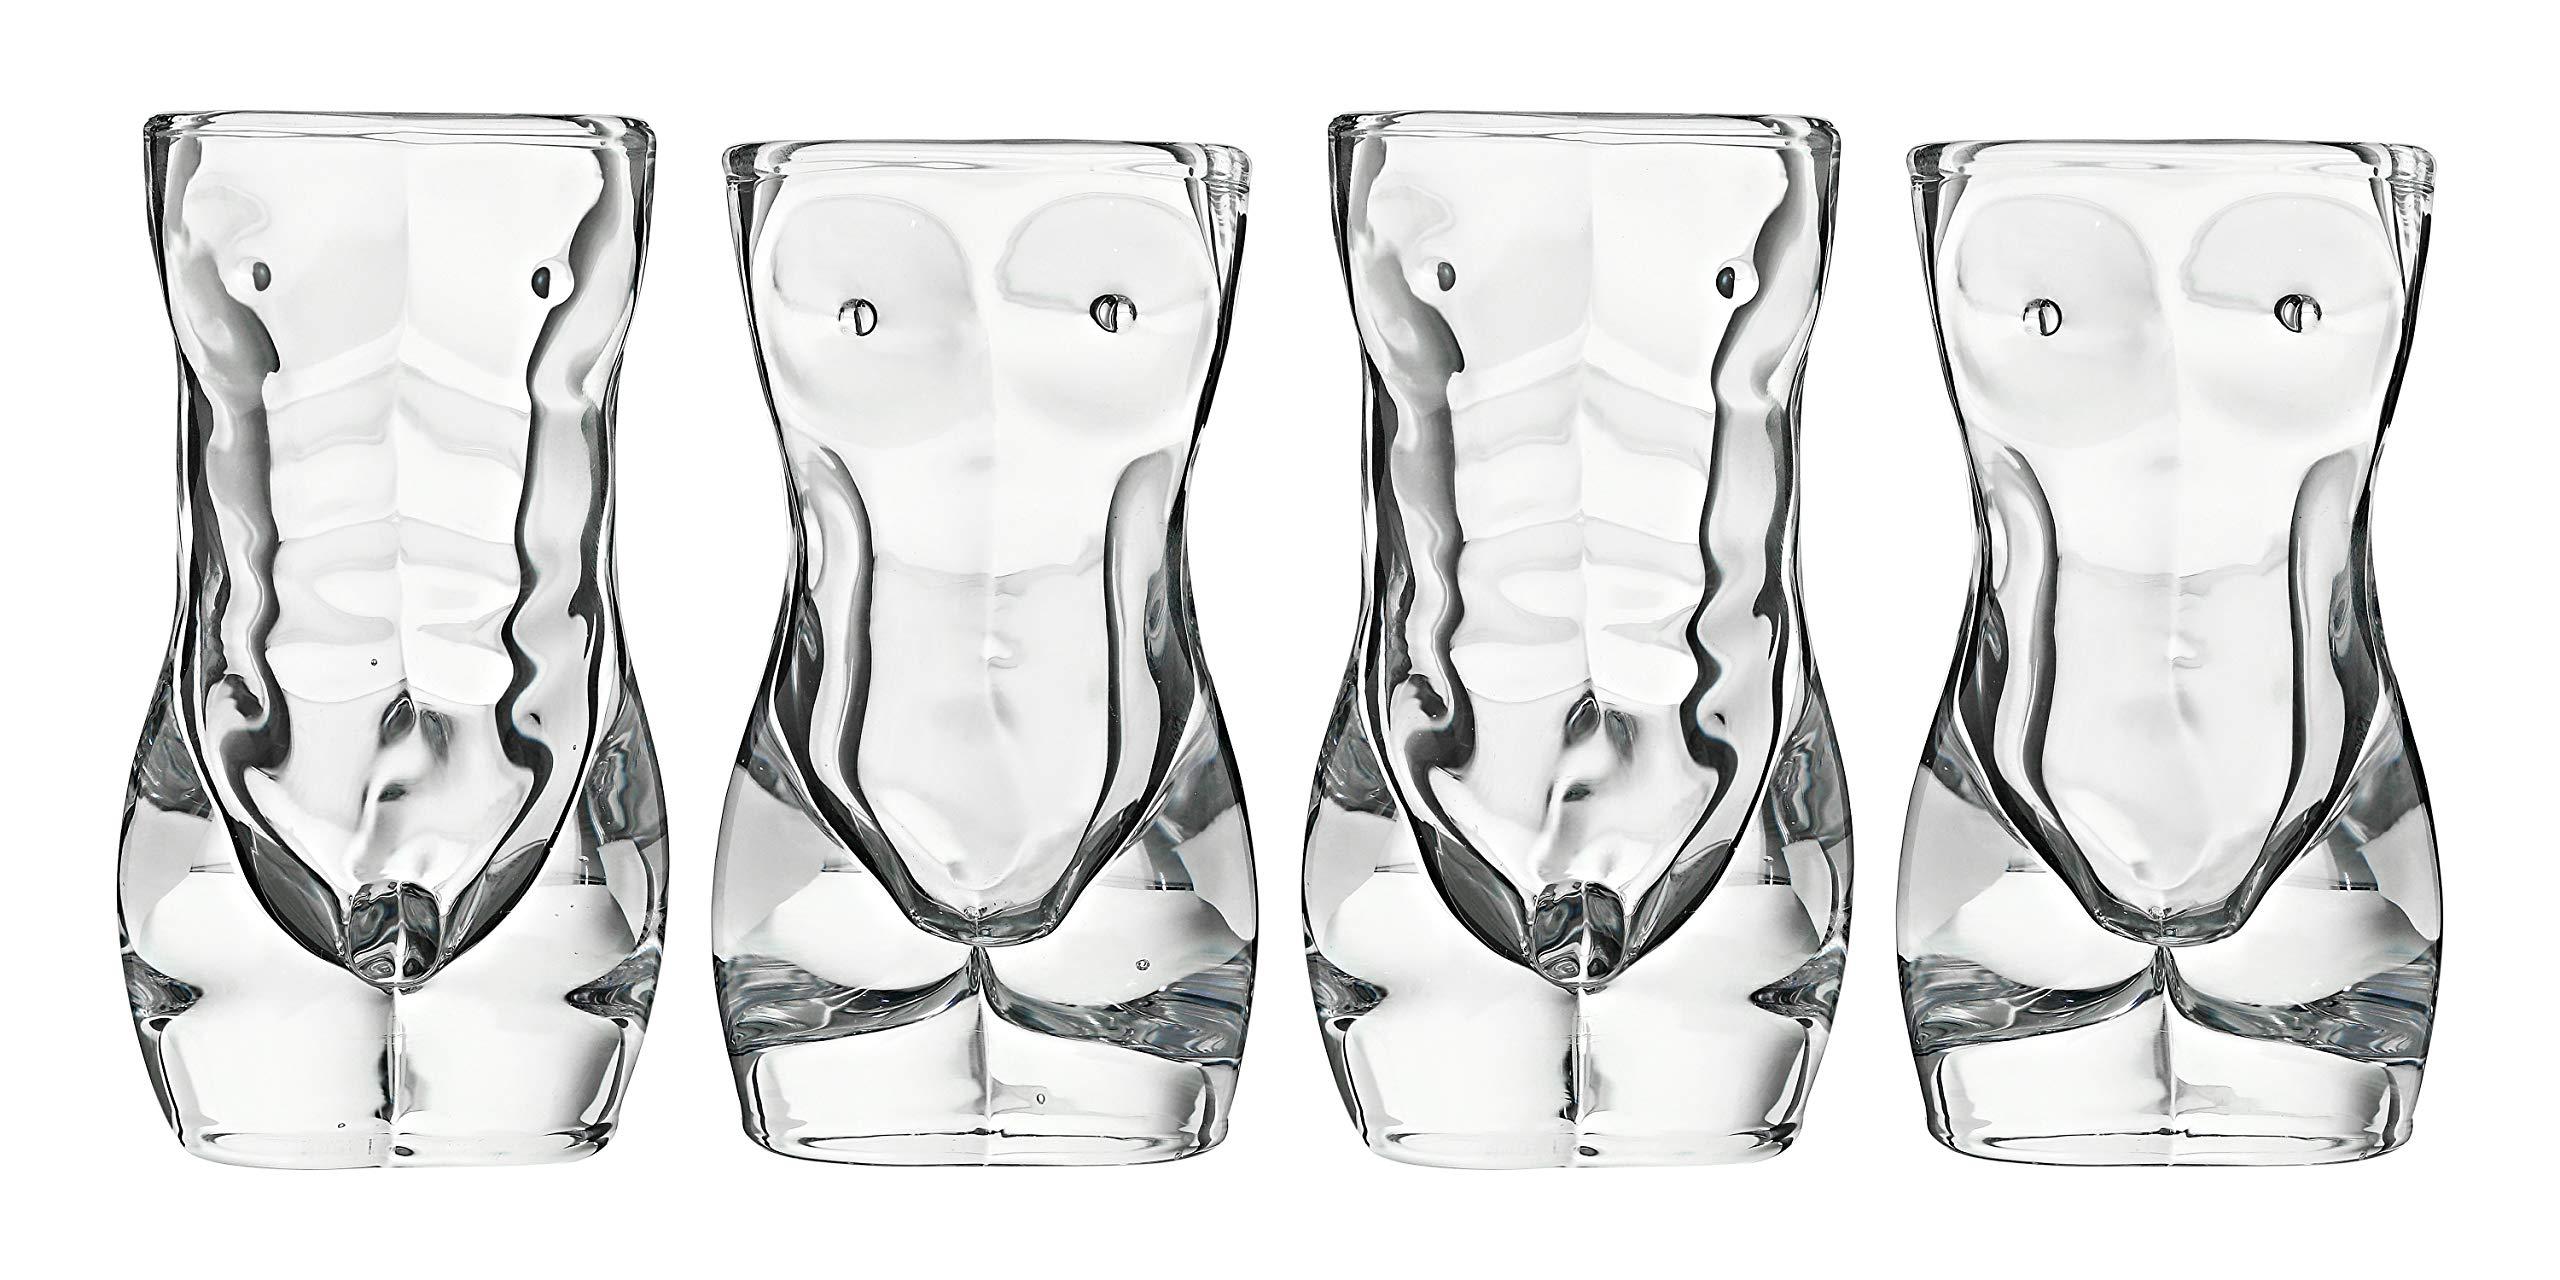 Sexy Exotic Adult Shotglasses, 2 Male + 2 Female per set by SFL Industries